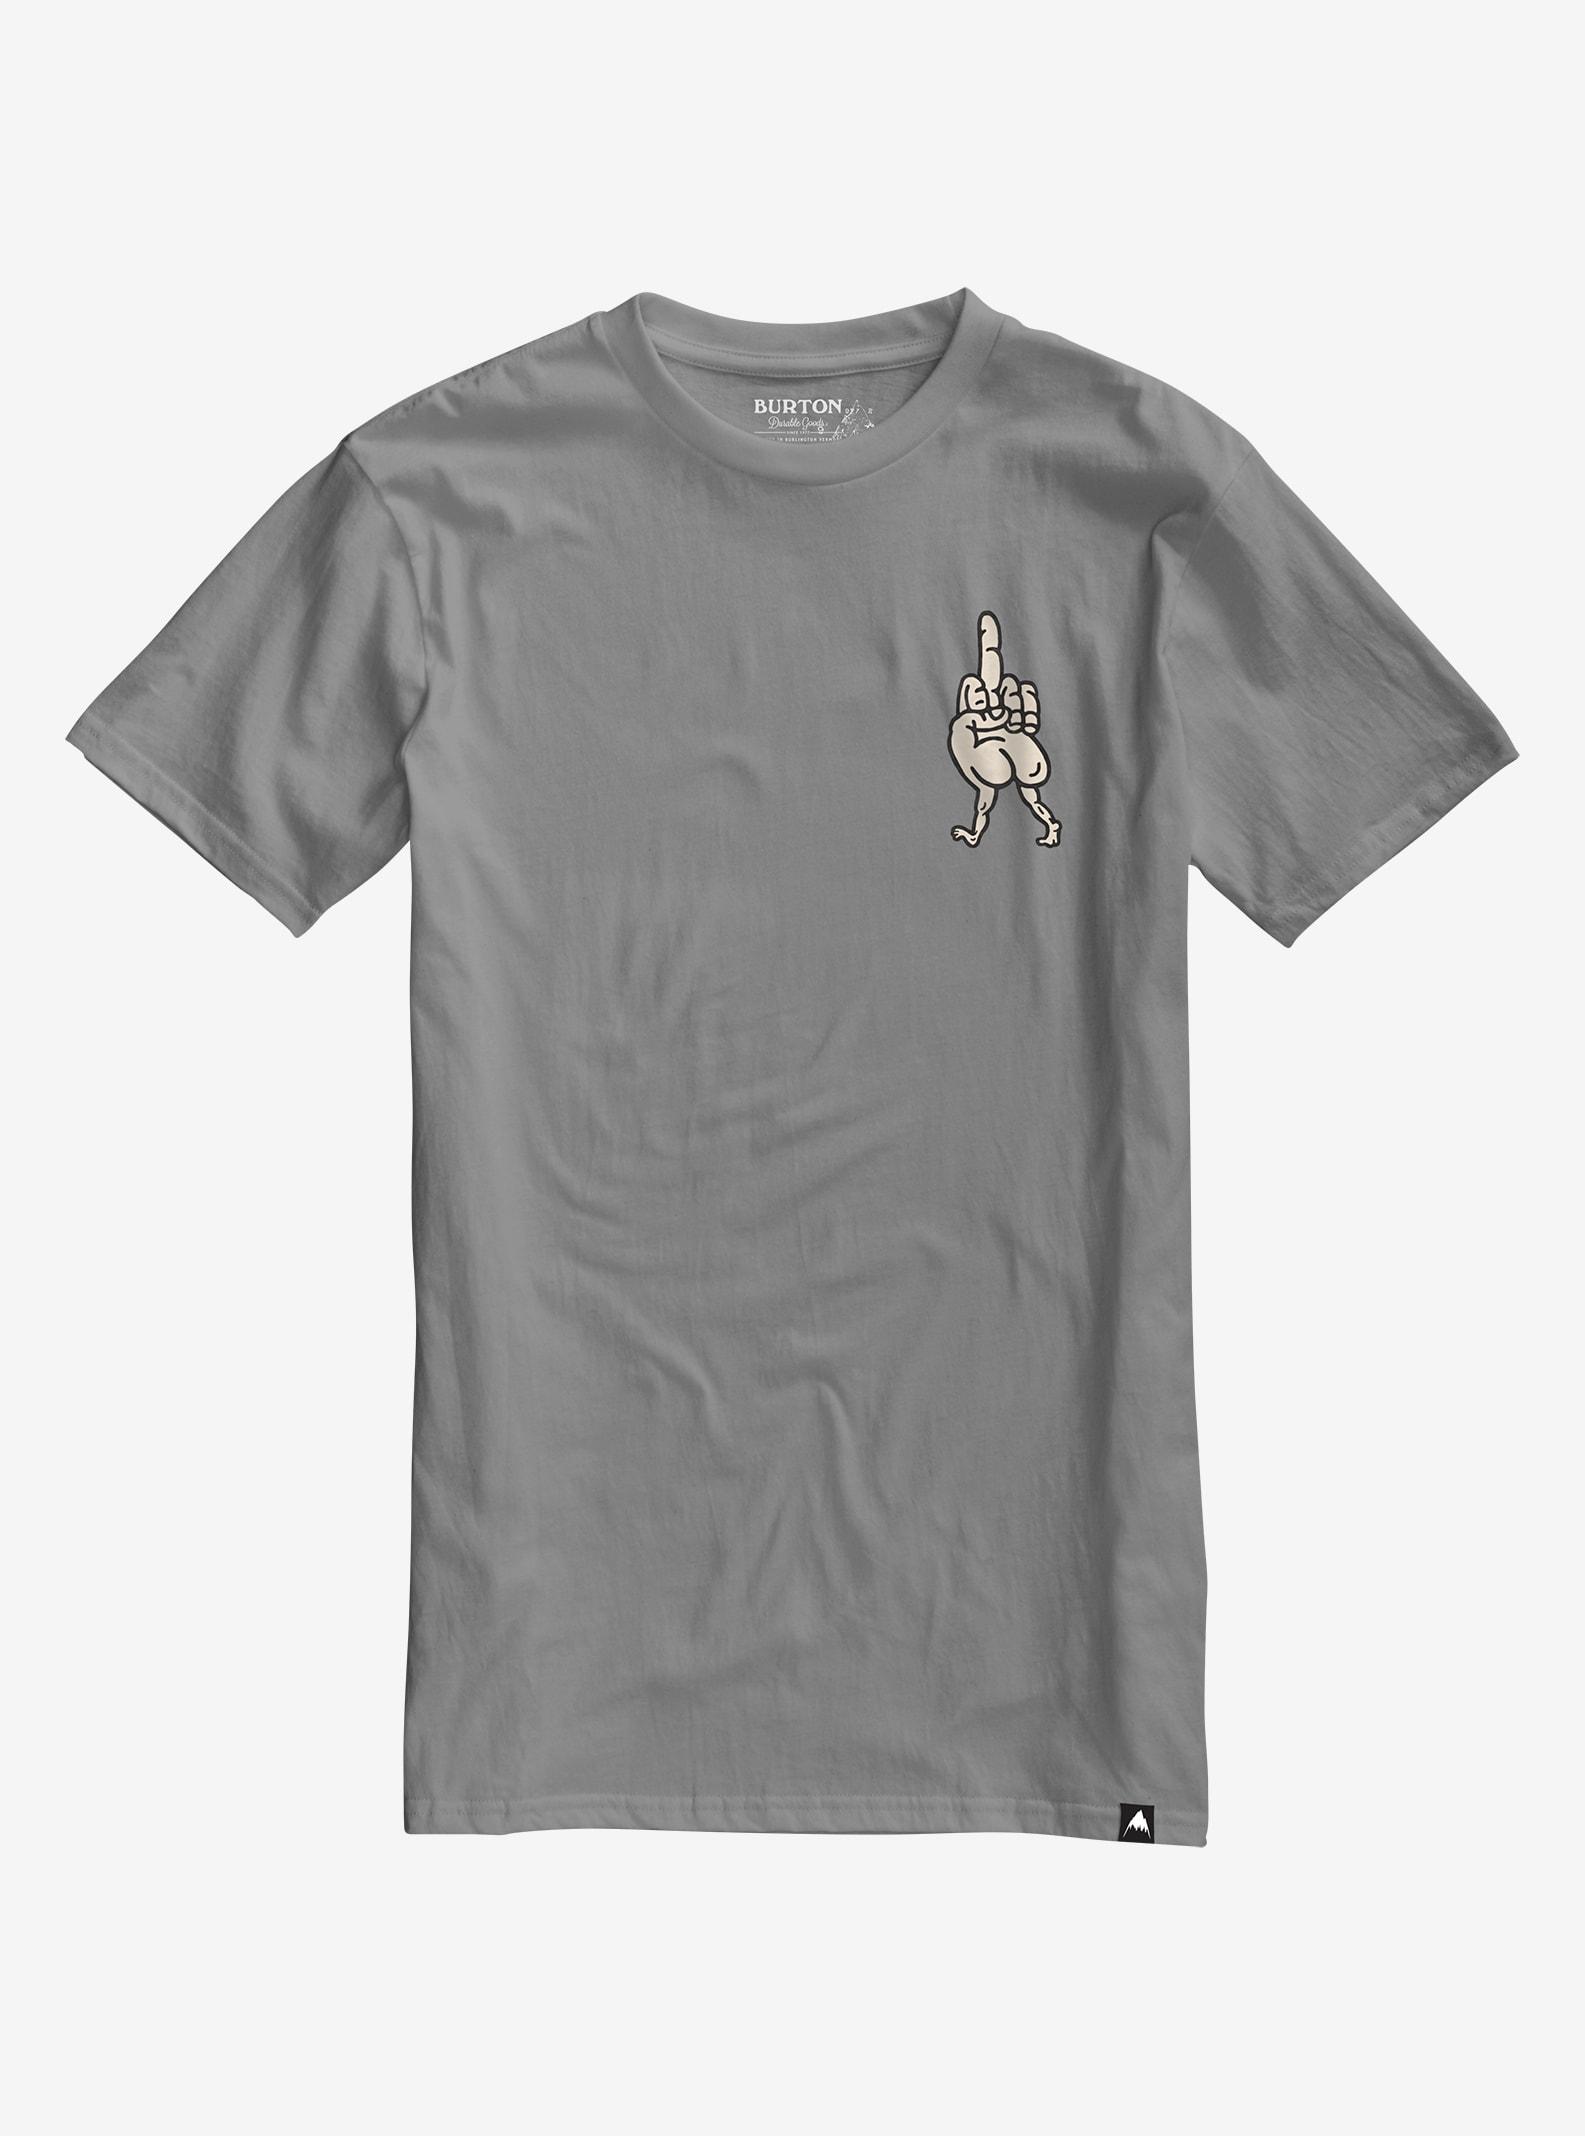 Burton Get Lost Short Sleeve T Shirt shown in Gray Heather